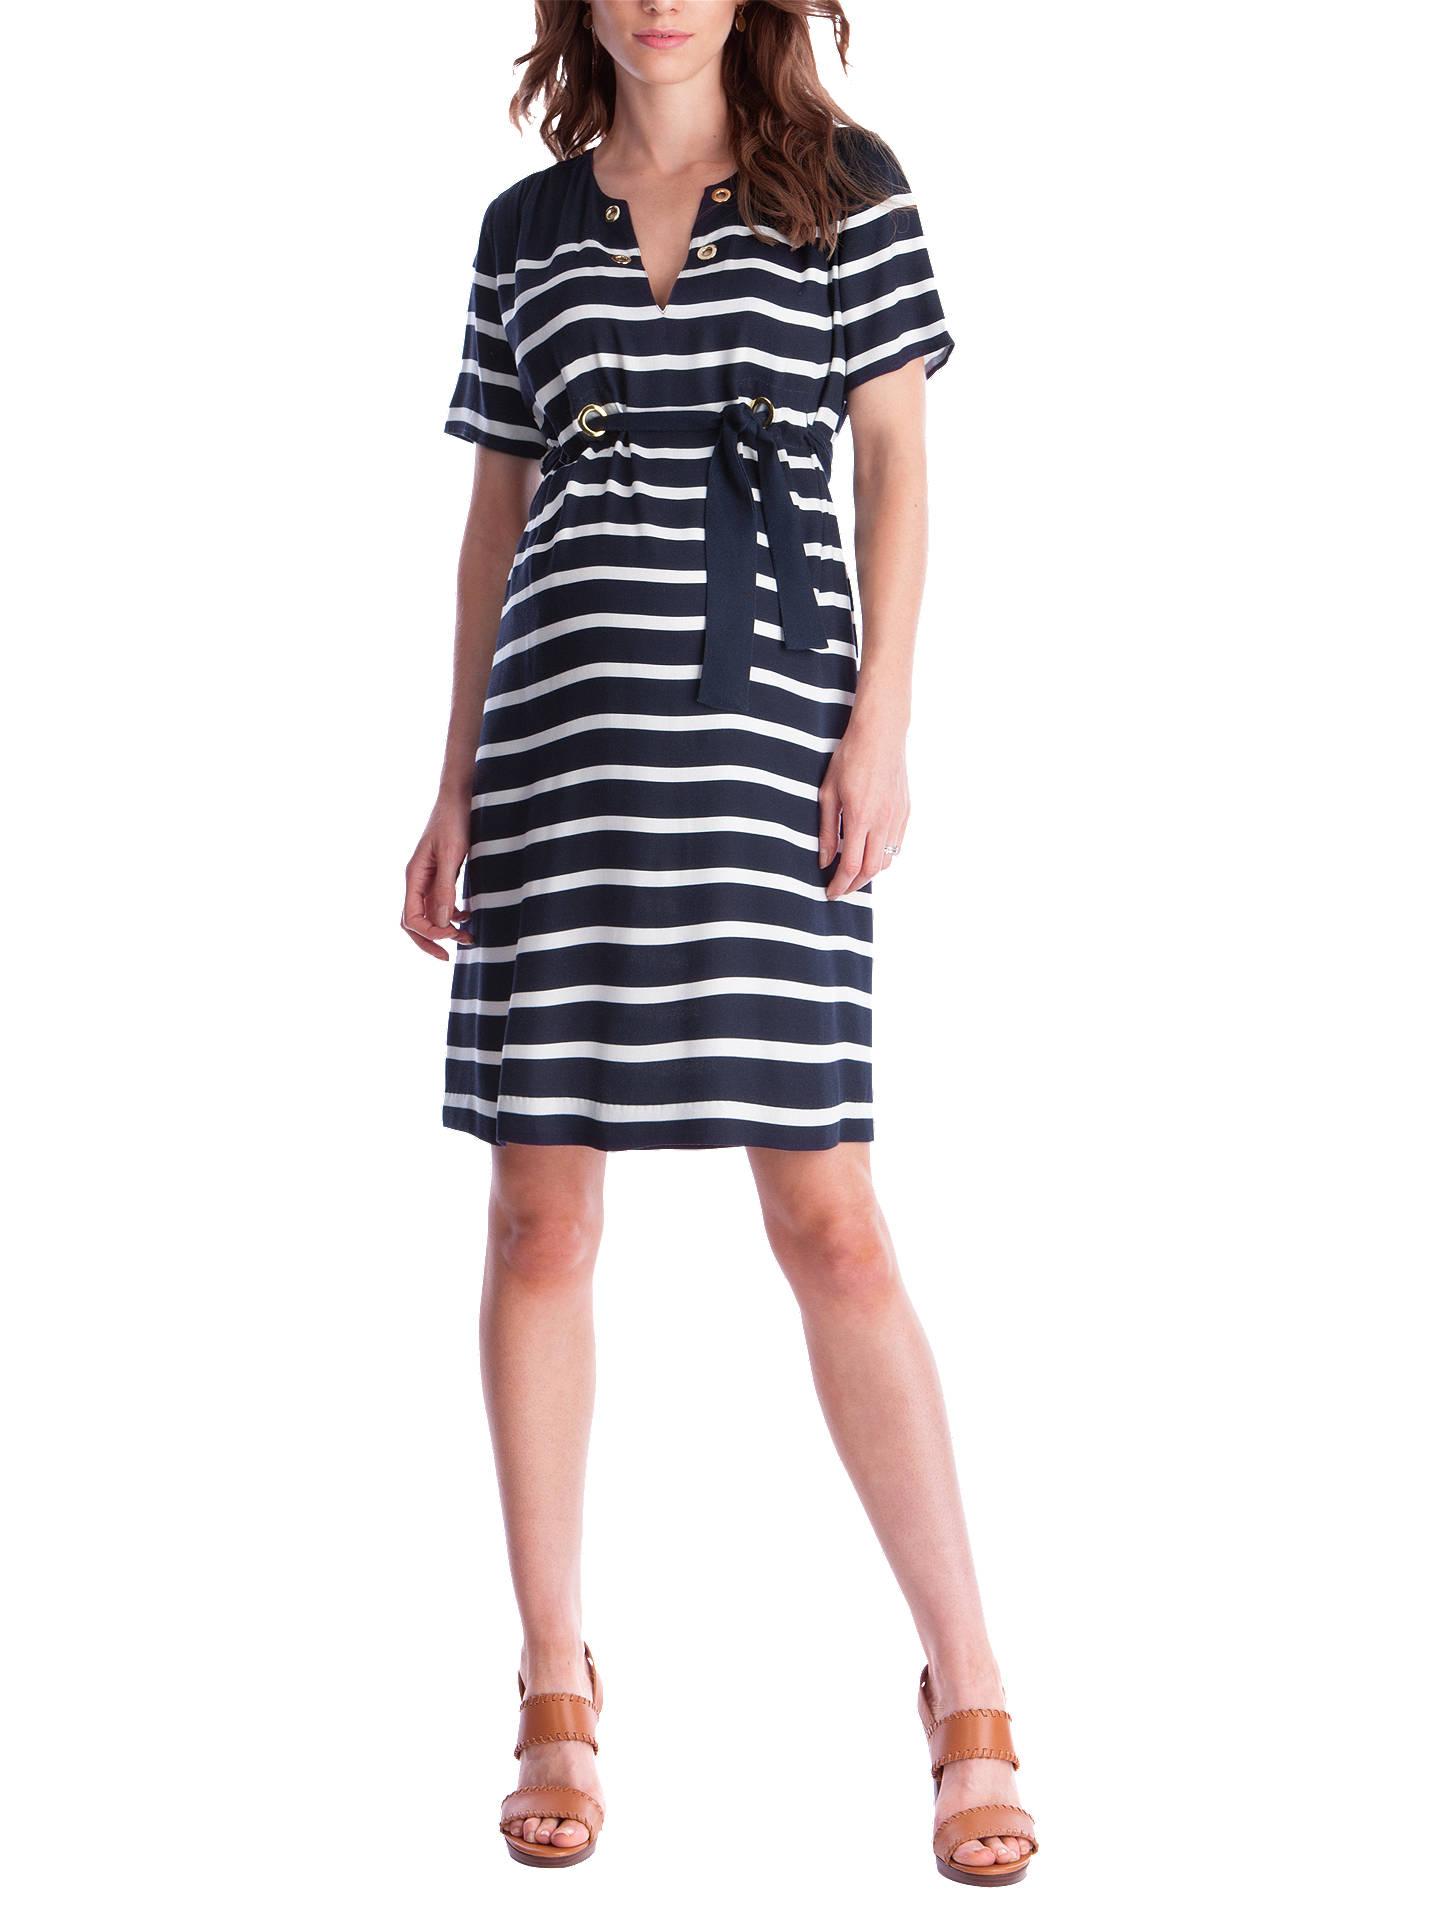 c932d61735095 Buy Séraphine Mattie Nautical Maternity Dress, Blue/White, 8 Online at  johnlewis.